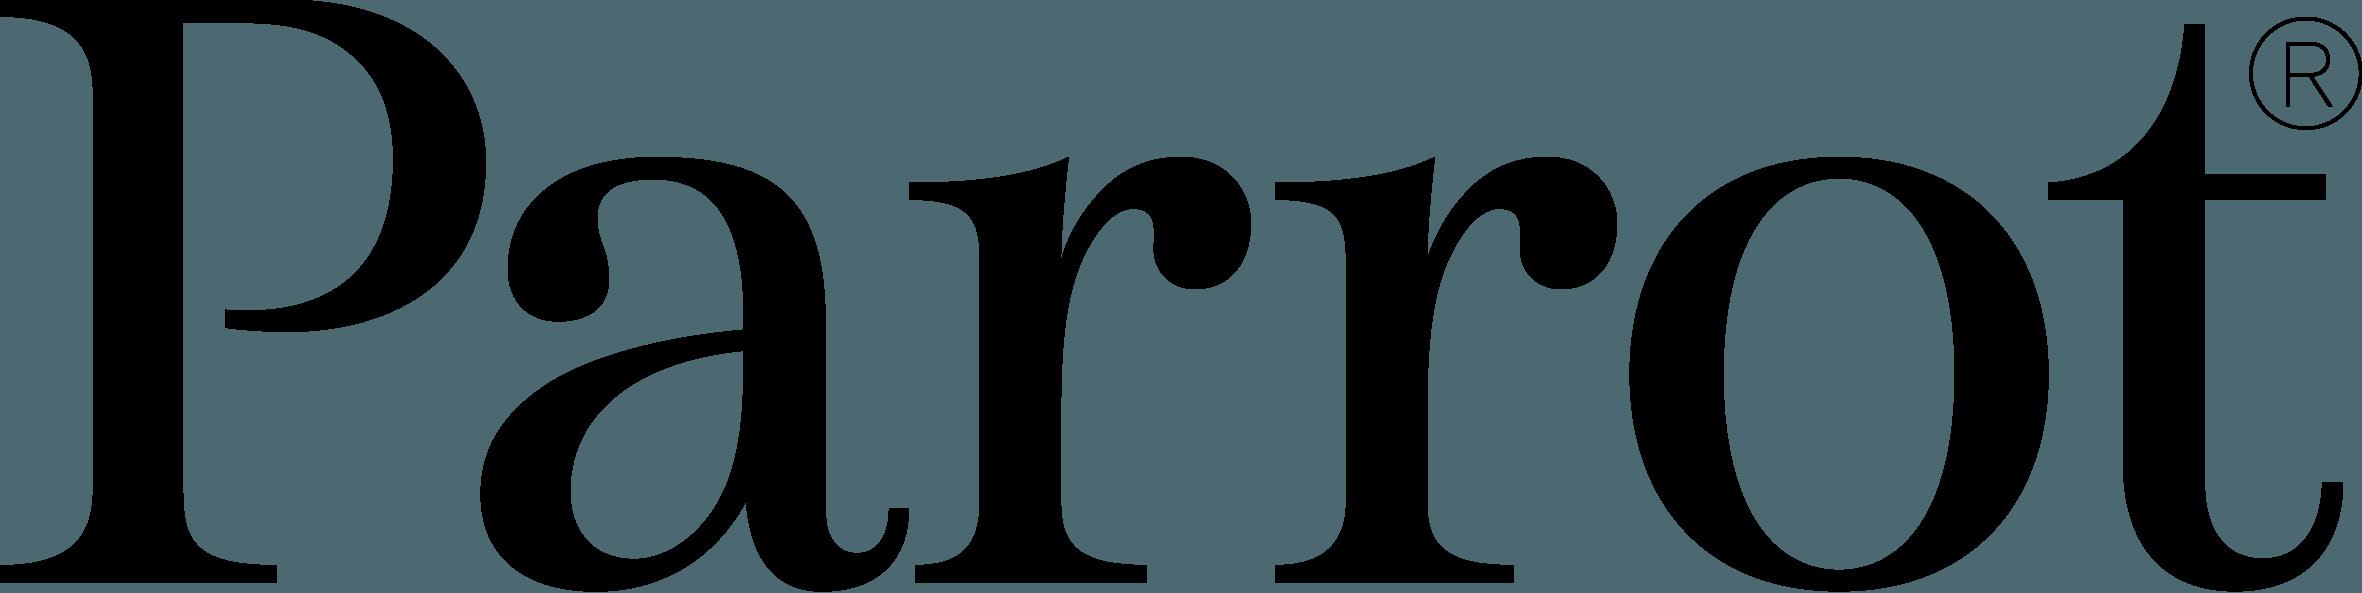 Parrot Logo png